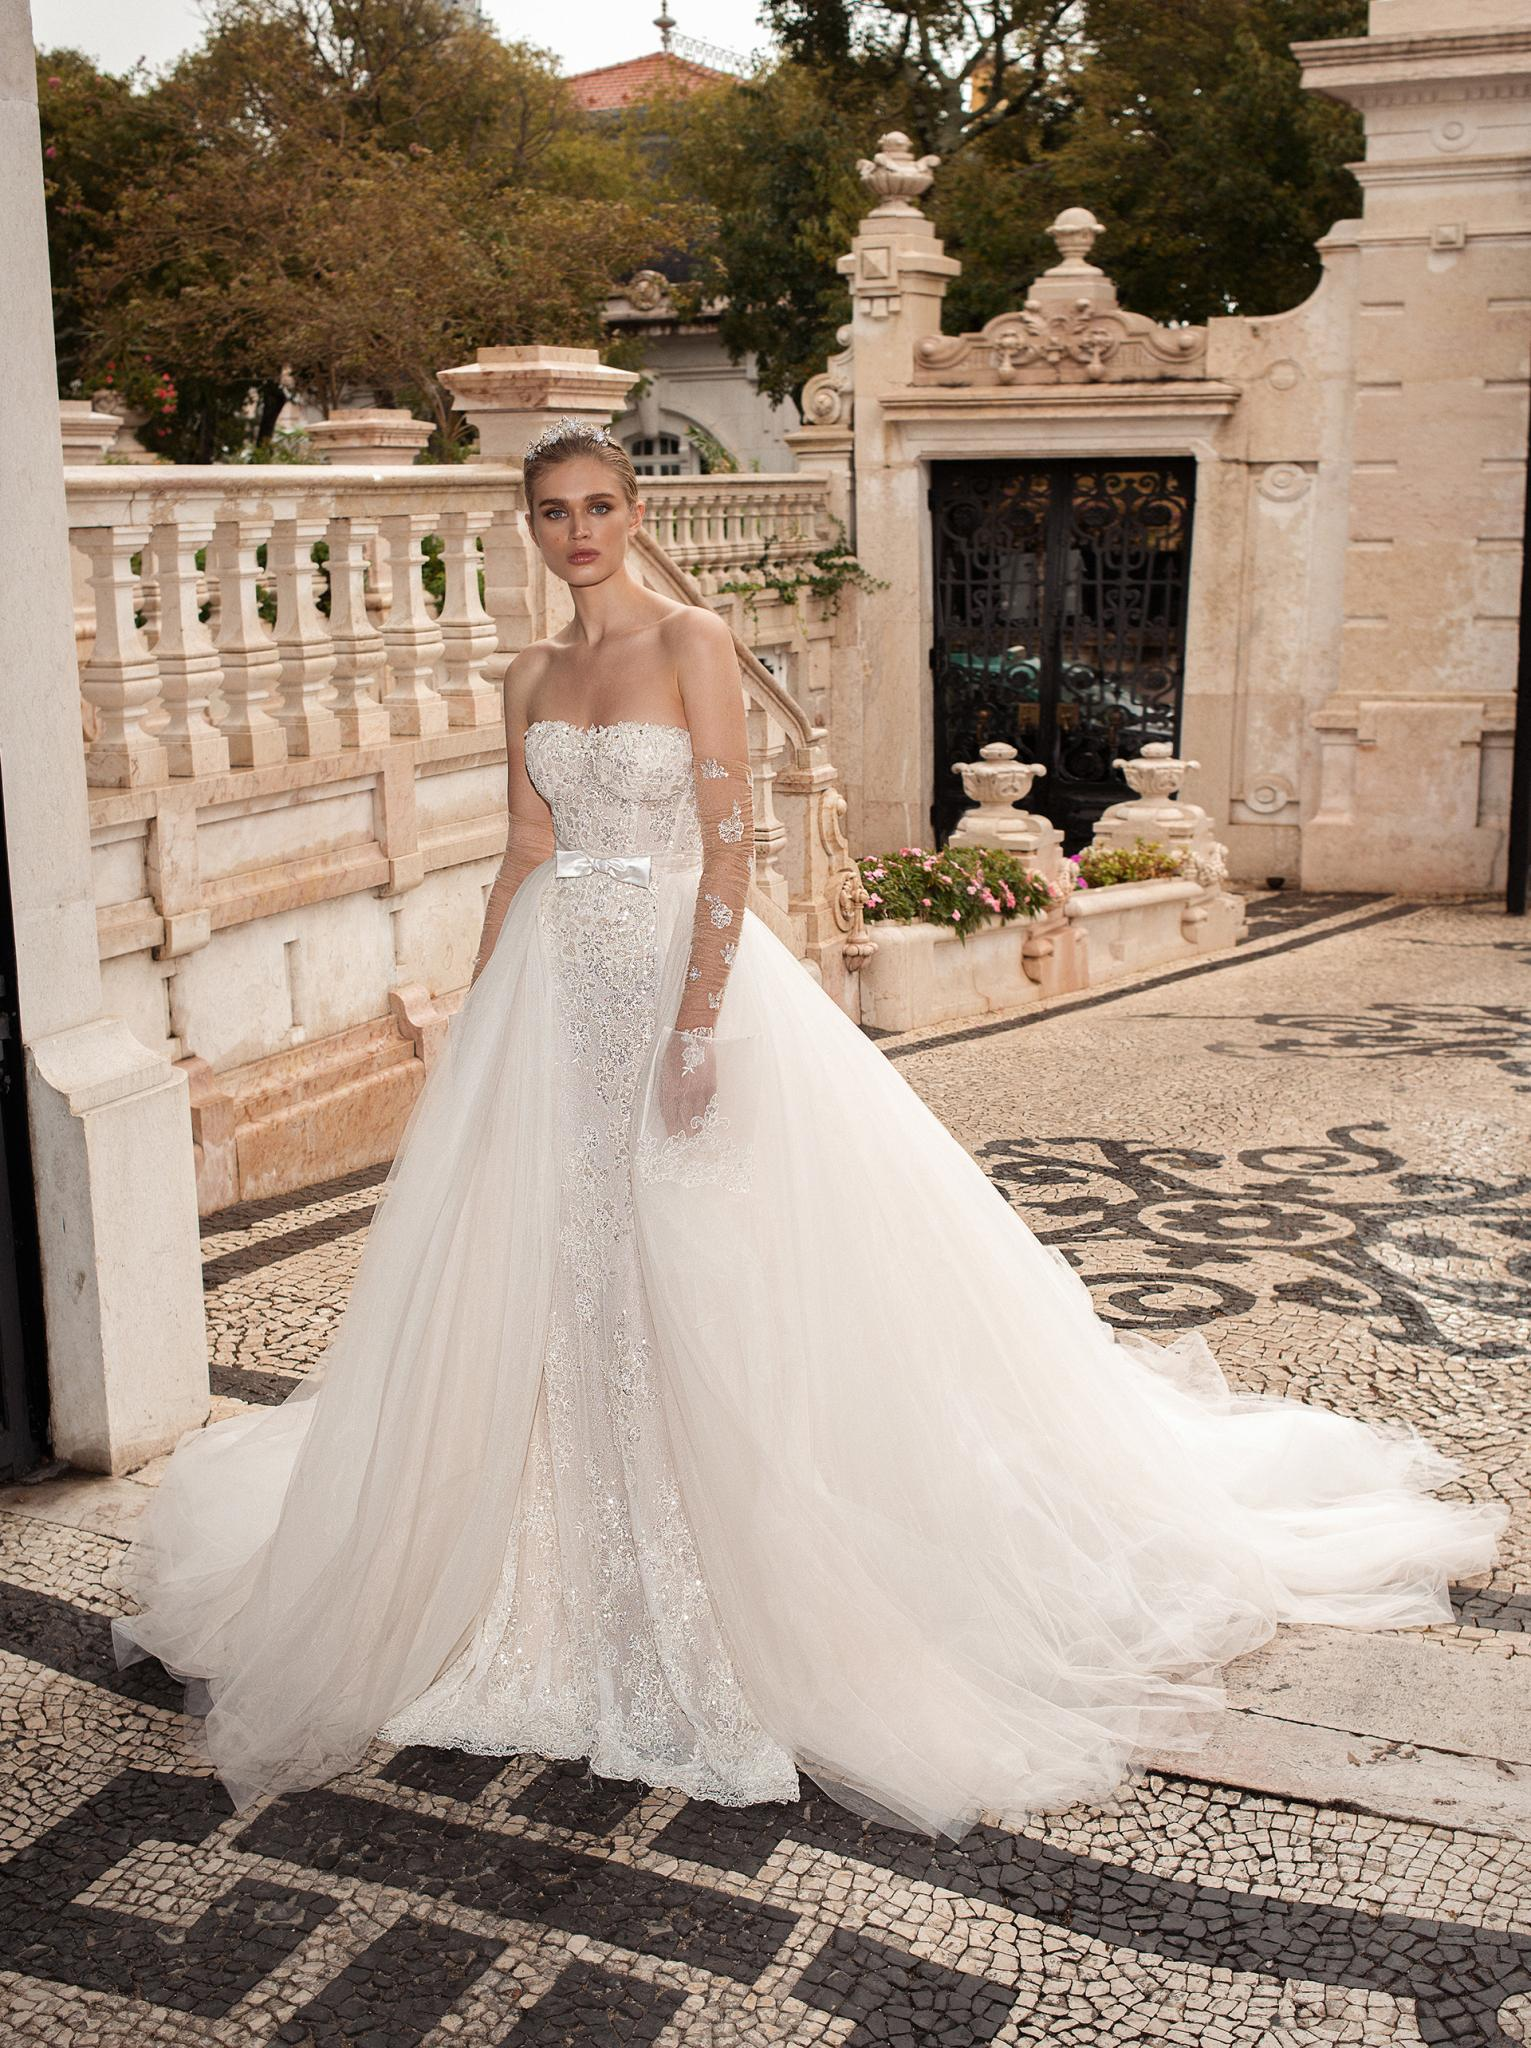 f66d9872f570 Alba - Alegria - Bridal Dresses - Galia Lahav